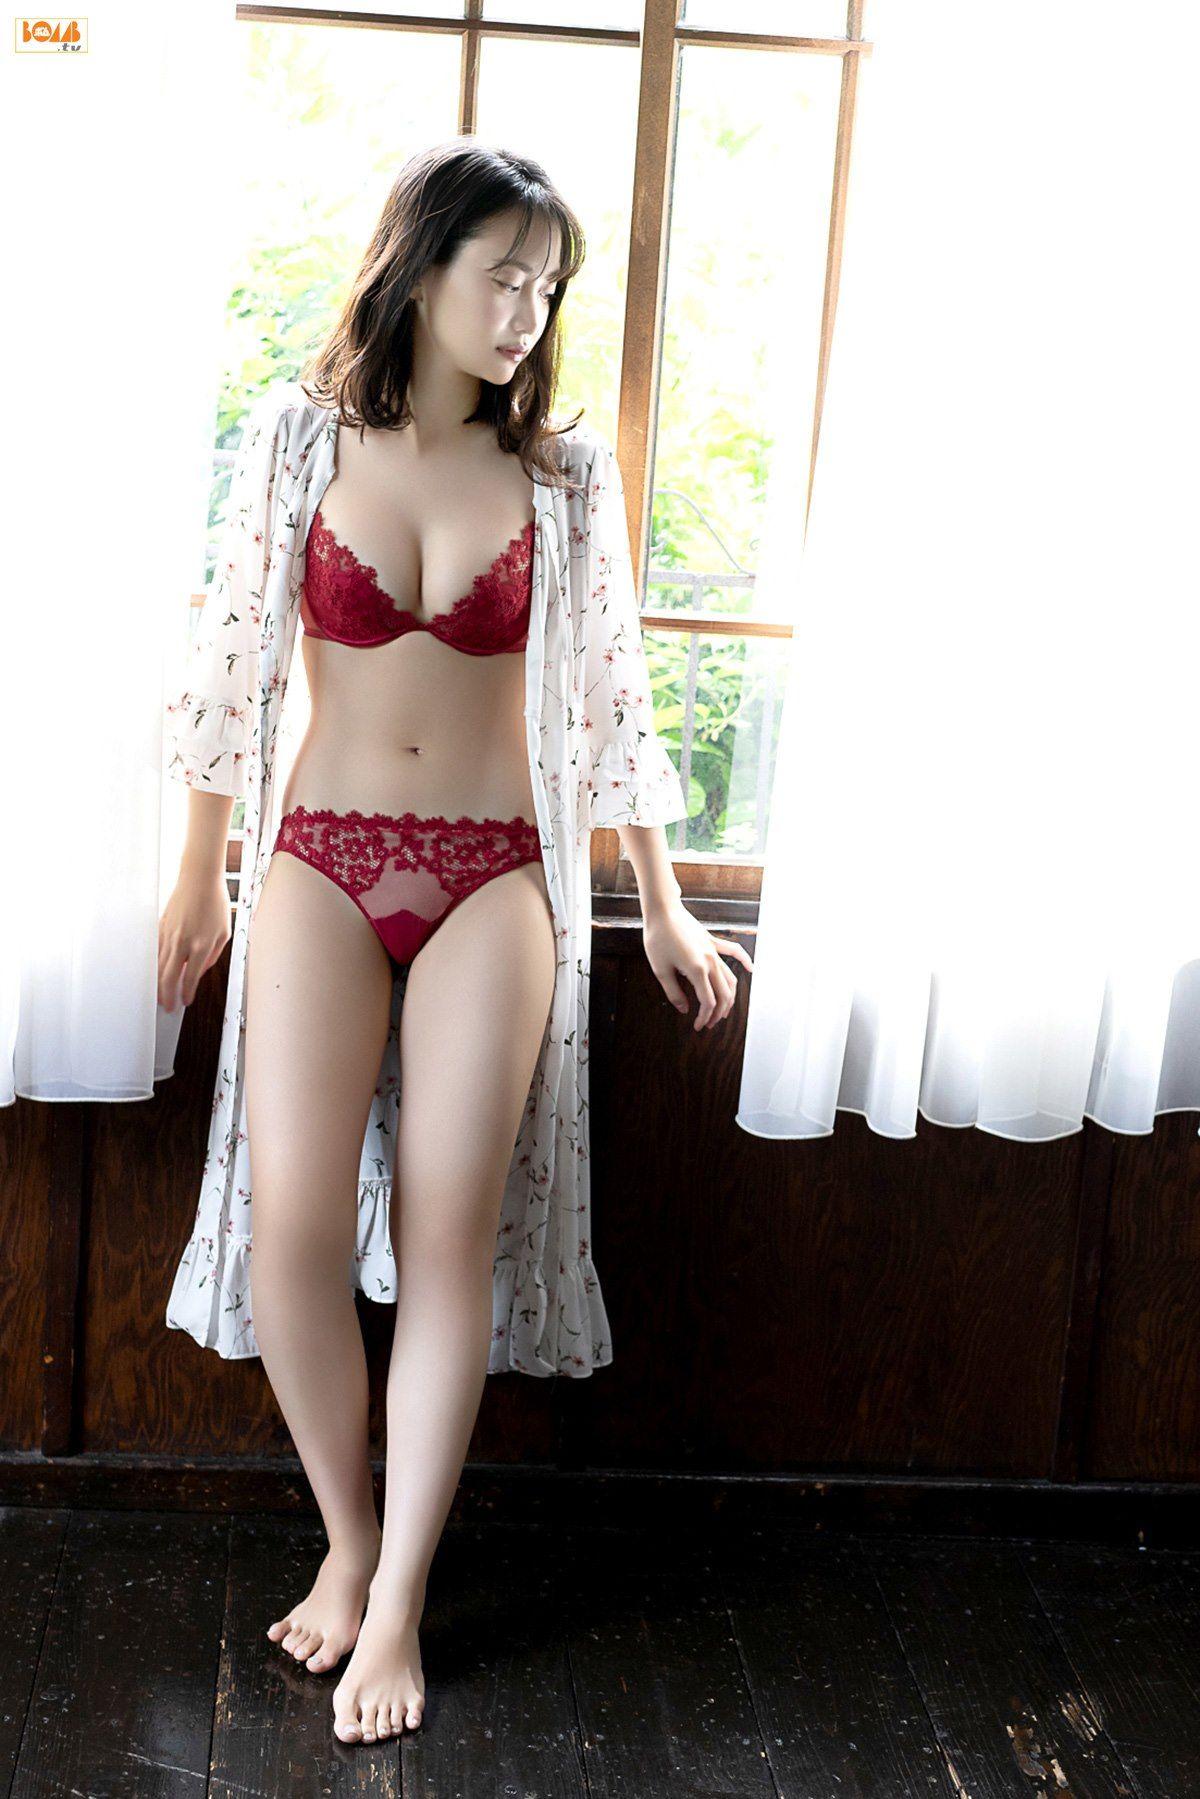 VOL.77 [Bomb.TV]美胸性感美女日本嫩模:永尾玛利亚(永尾まりや)超高清写真套图(57P)